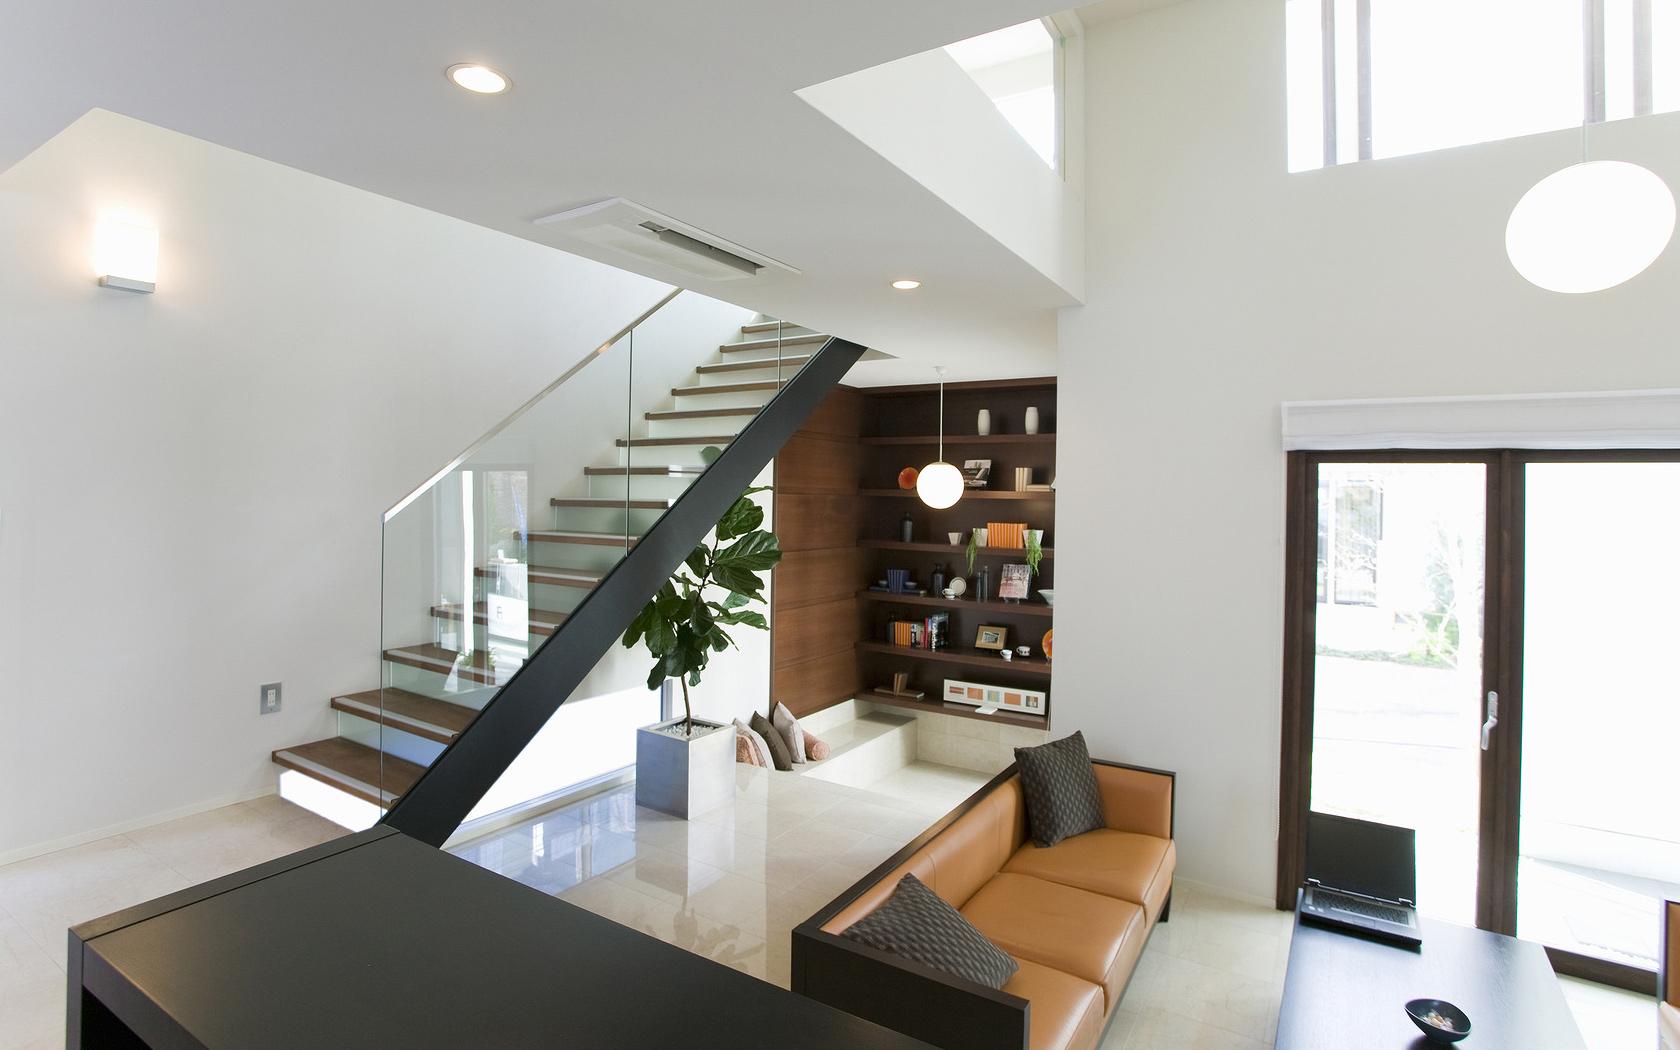 immobilier 06 alpes maritimes 83 var portail. Black Bedroom Furniture Sets. Home Design Ideas